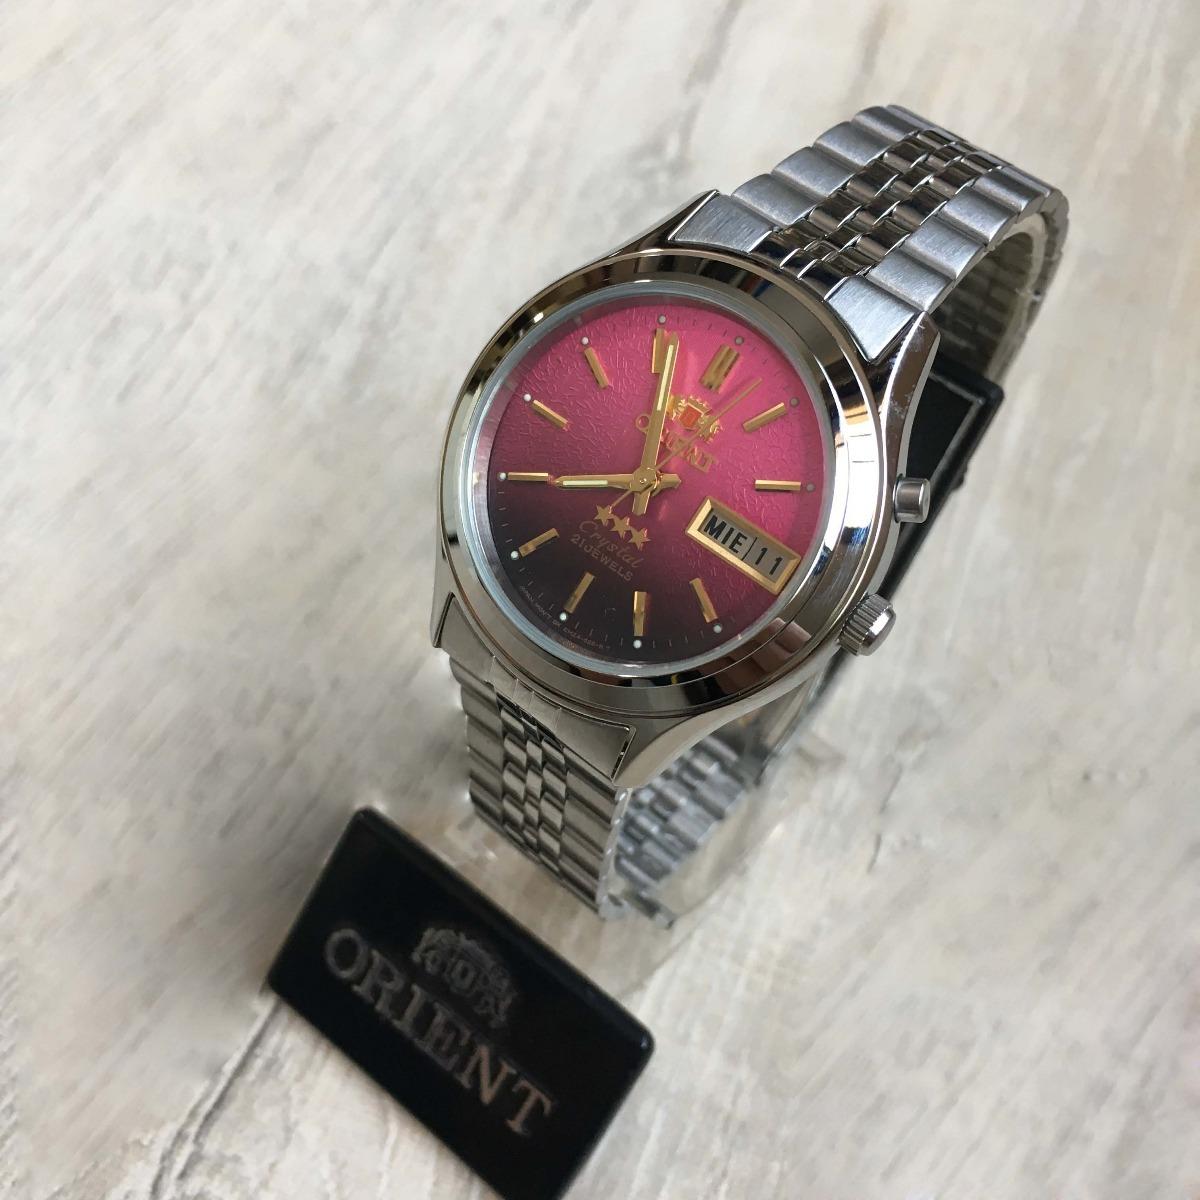 cc3388b841f Relógio Orient Automatico Masculino Original Prata C  Caixa - R  329 ...